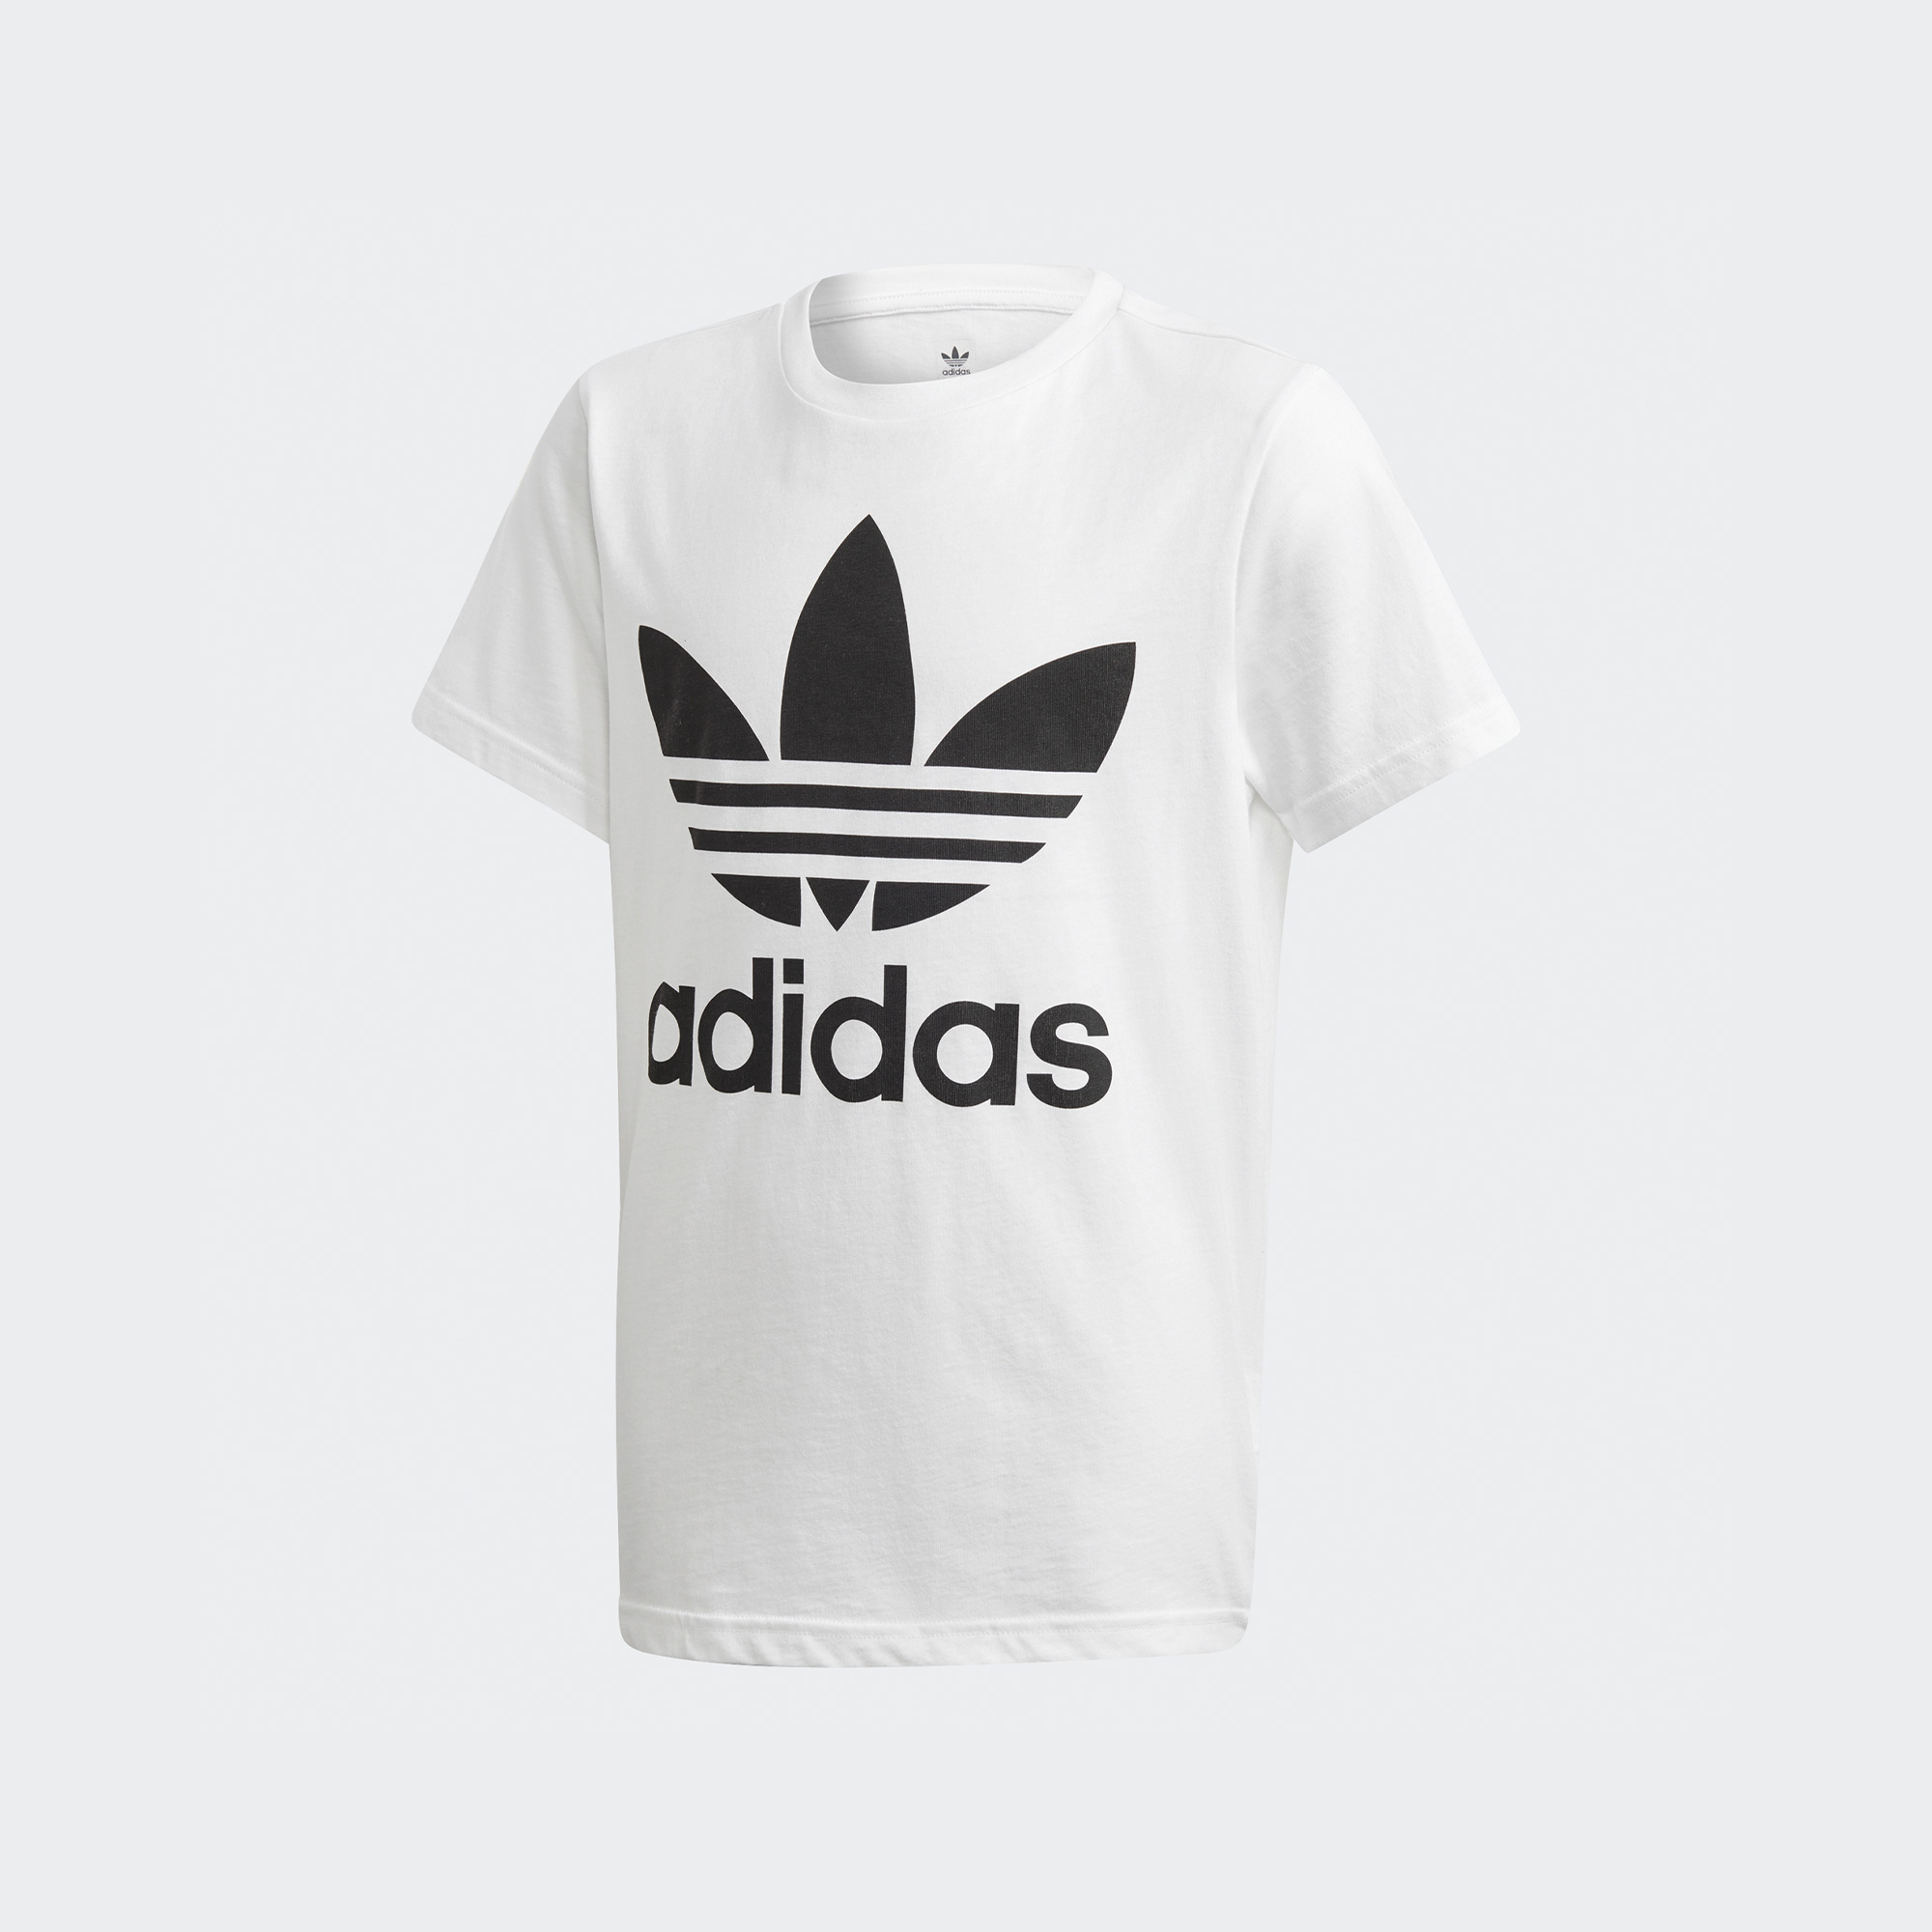 adidas Trefoil Çocuk Beyaz T-Shirt